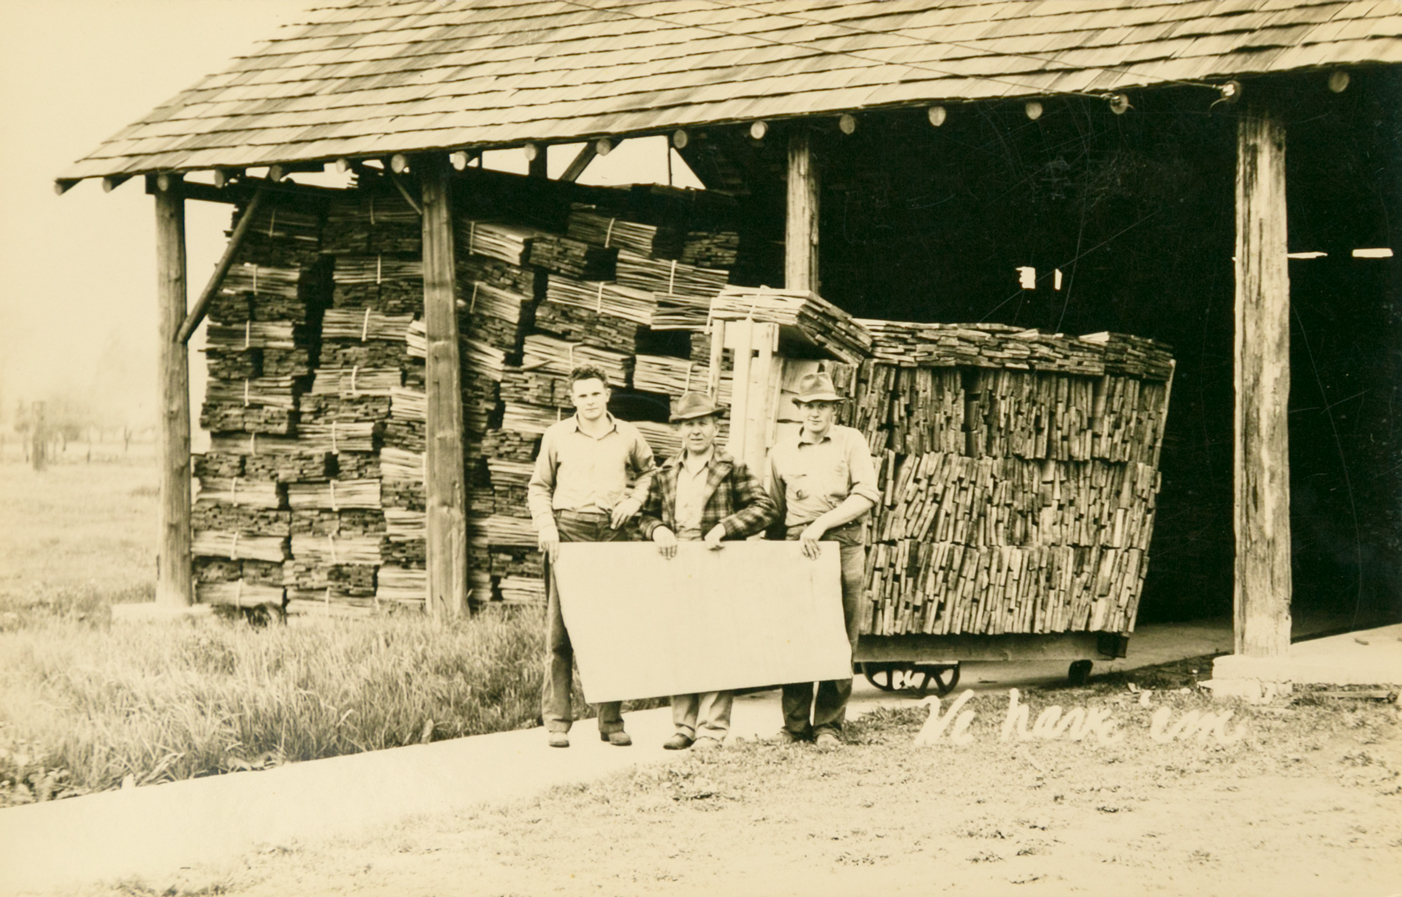 Cedar Crest Shake Mill, circa 1950 - Left to right; Stanley Janicki, Jr., Stanley Janicki, Sr., Walter Janicki.